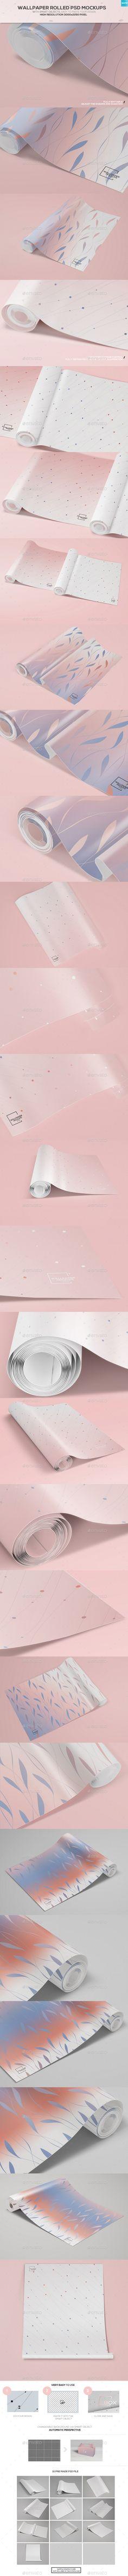 Wallpaper Rolled PSD Mockups. Download here: http://graphicriver.net/item/wallpaper-rolled-psd-mockups/14568335?ref=ksioks